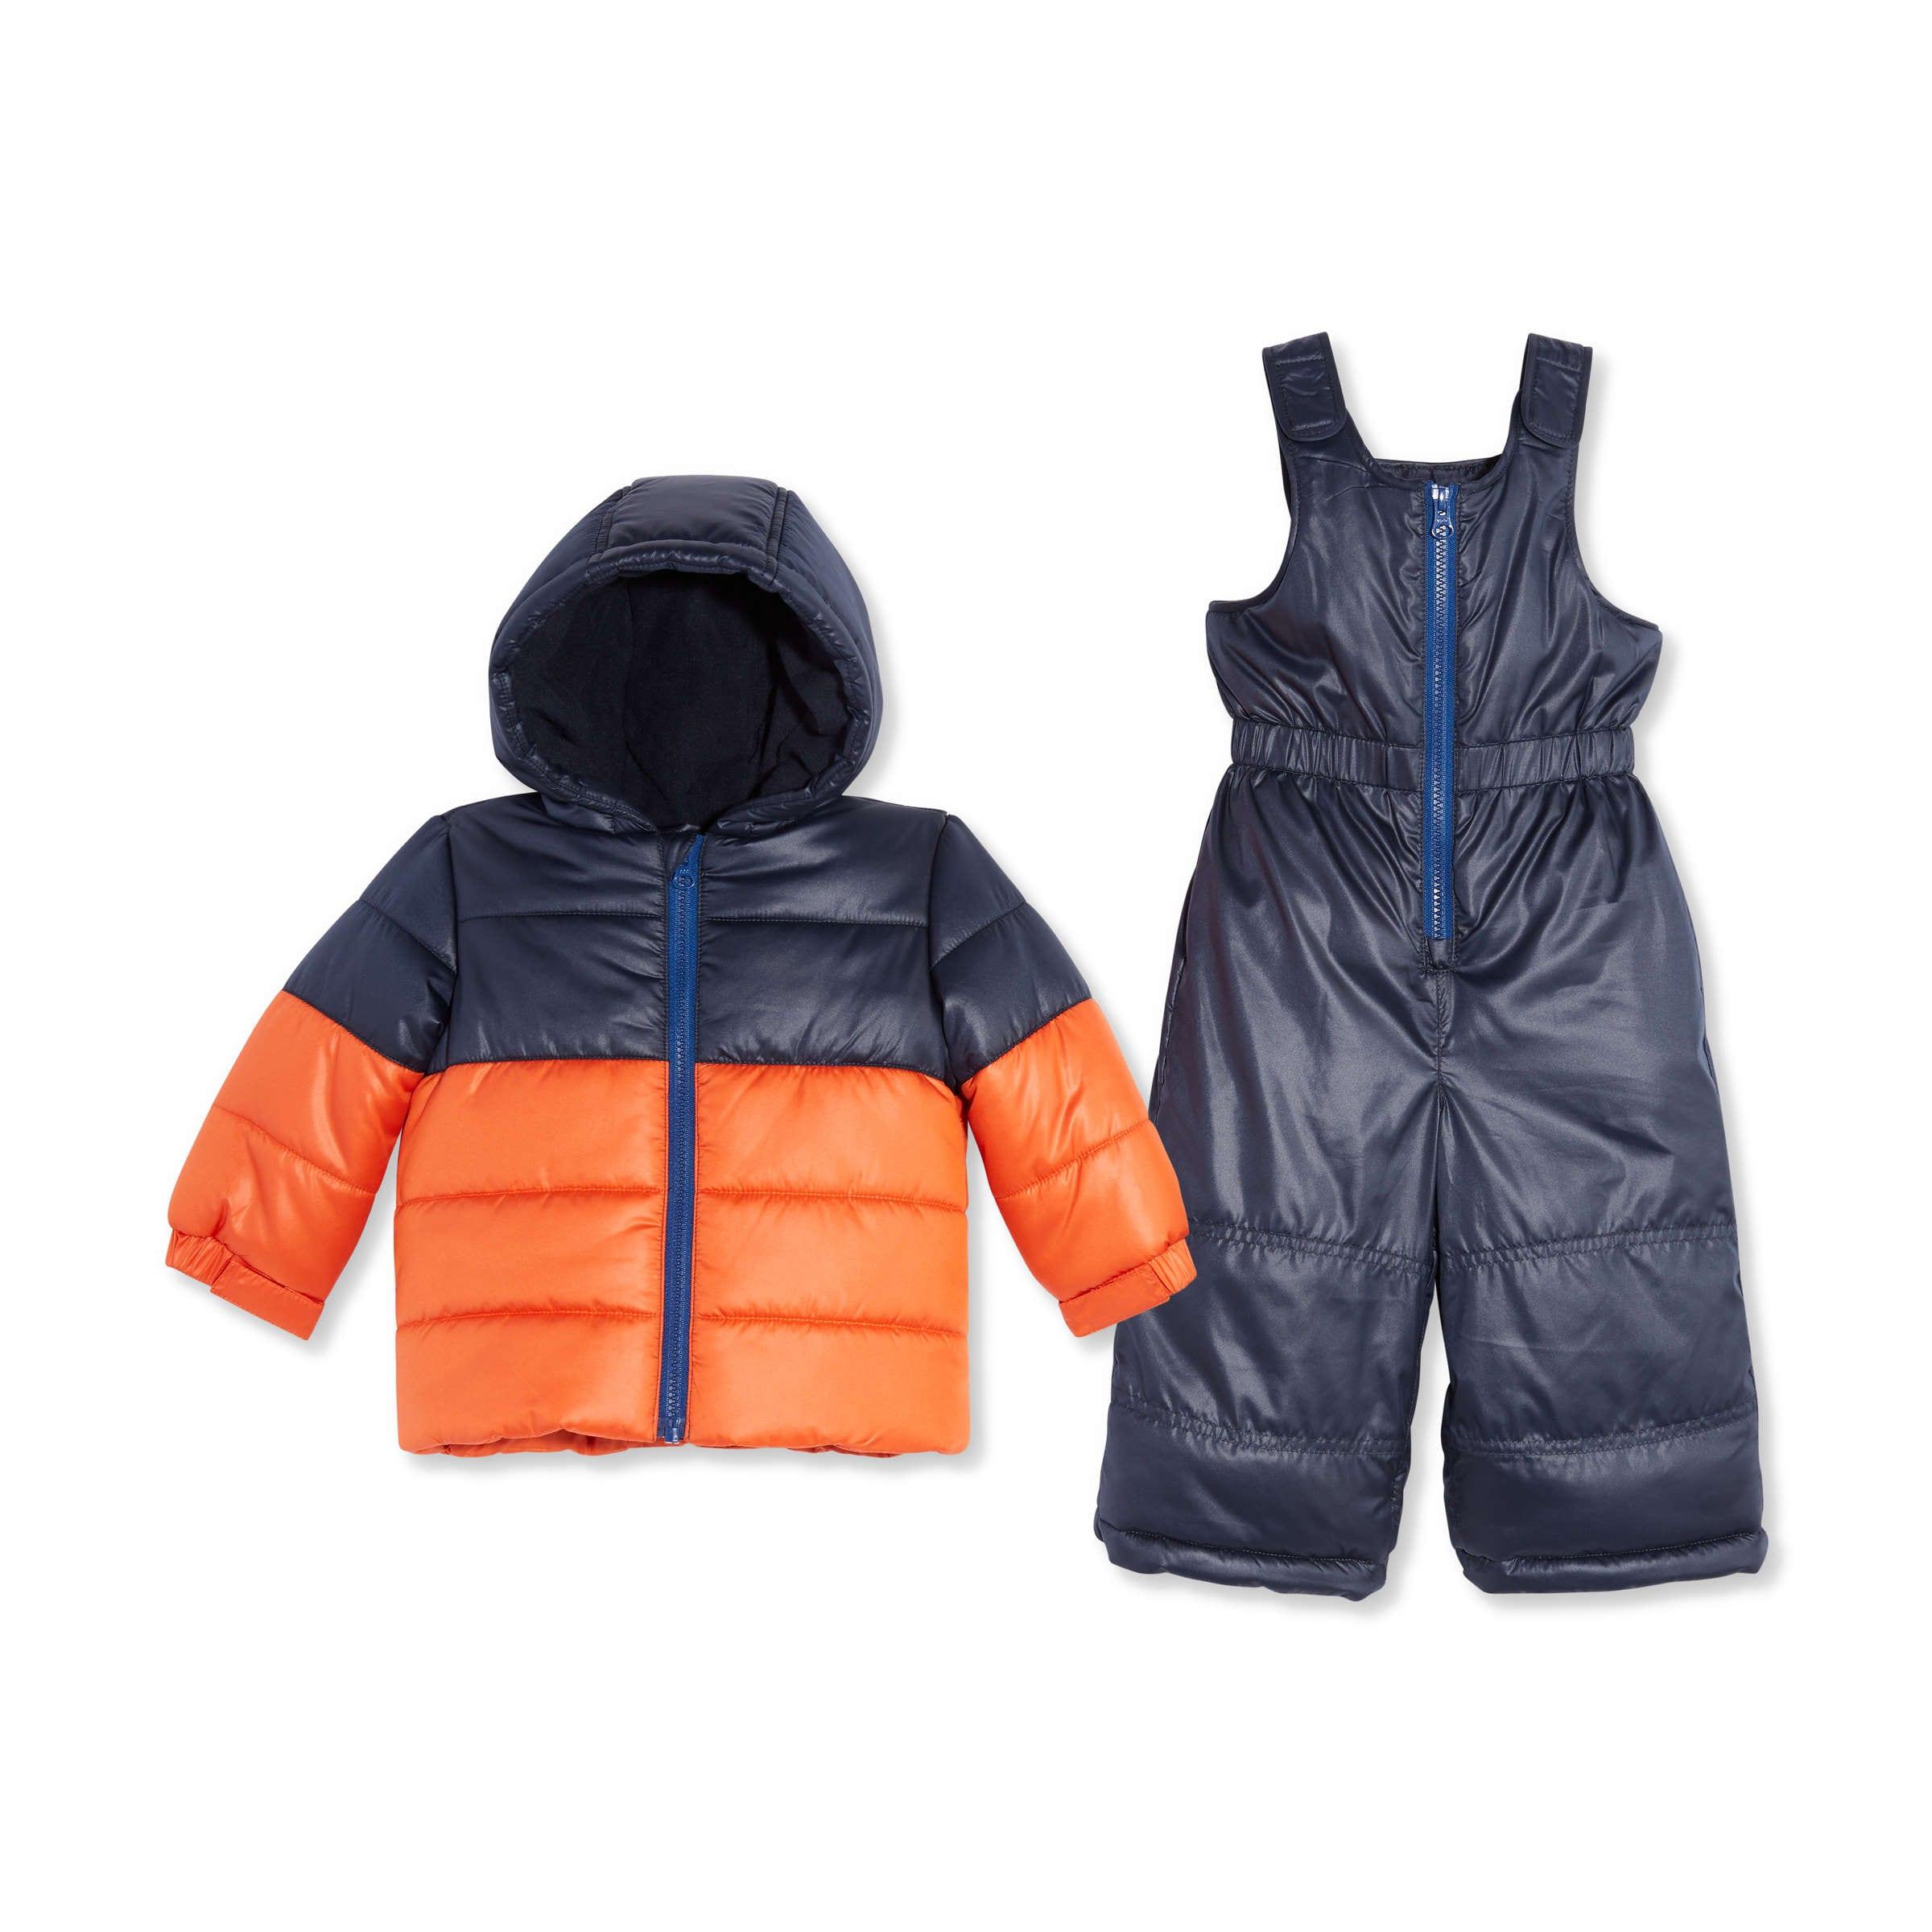 afb2b10da Baby Boys  2 Piece Snowsuit Set in Orange from Joe Fresh